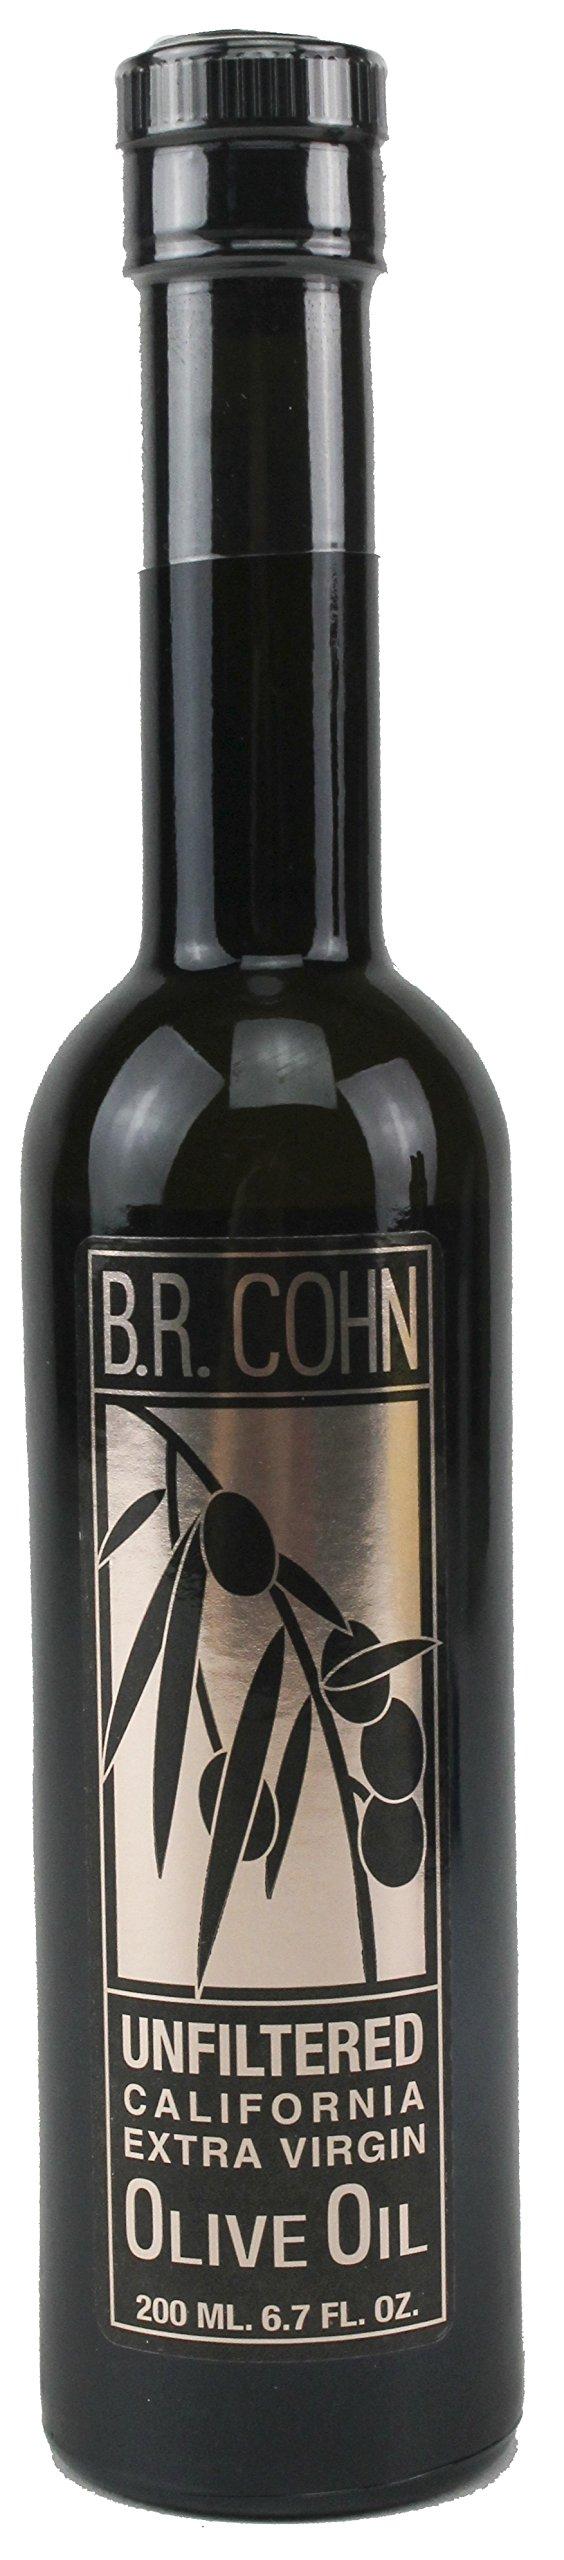 B.R. Cohn California Unfiltered Extra Virgin Olive Oil, 200 ml (6.7 oz)